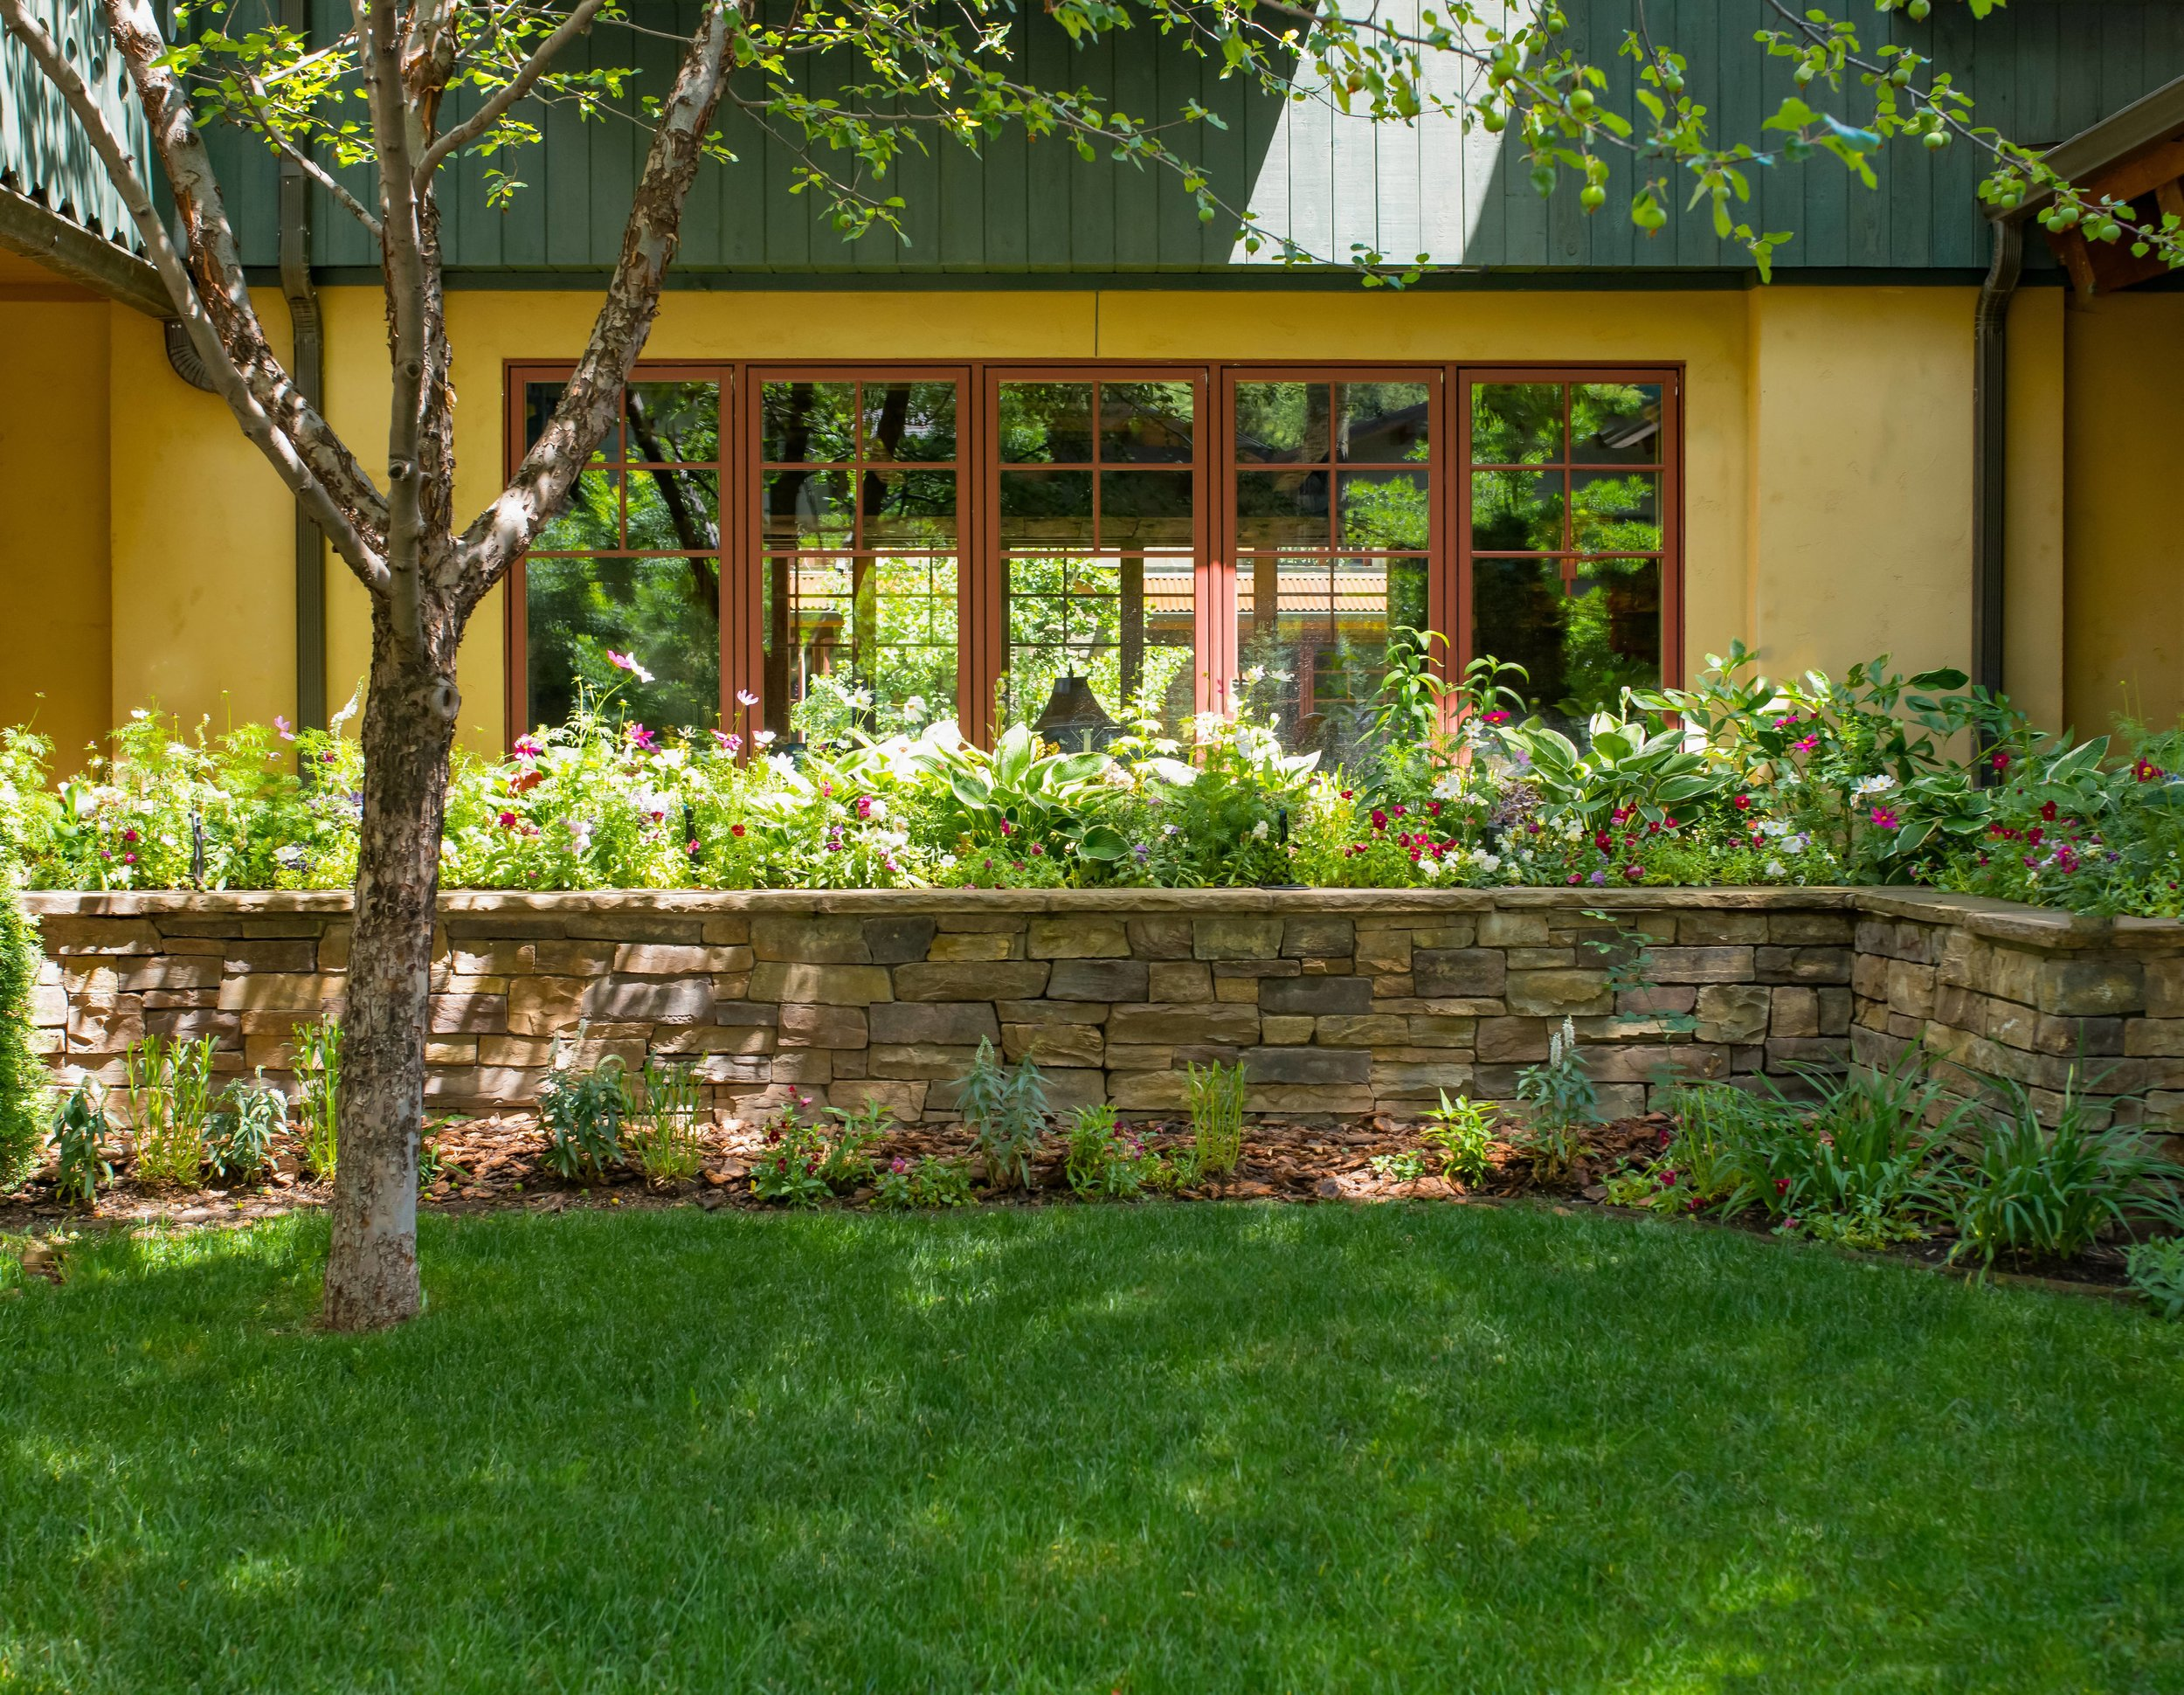 Aspen Hotel Landscape Planning